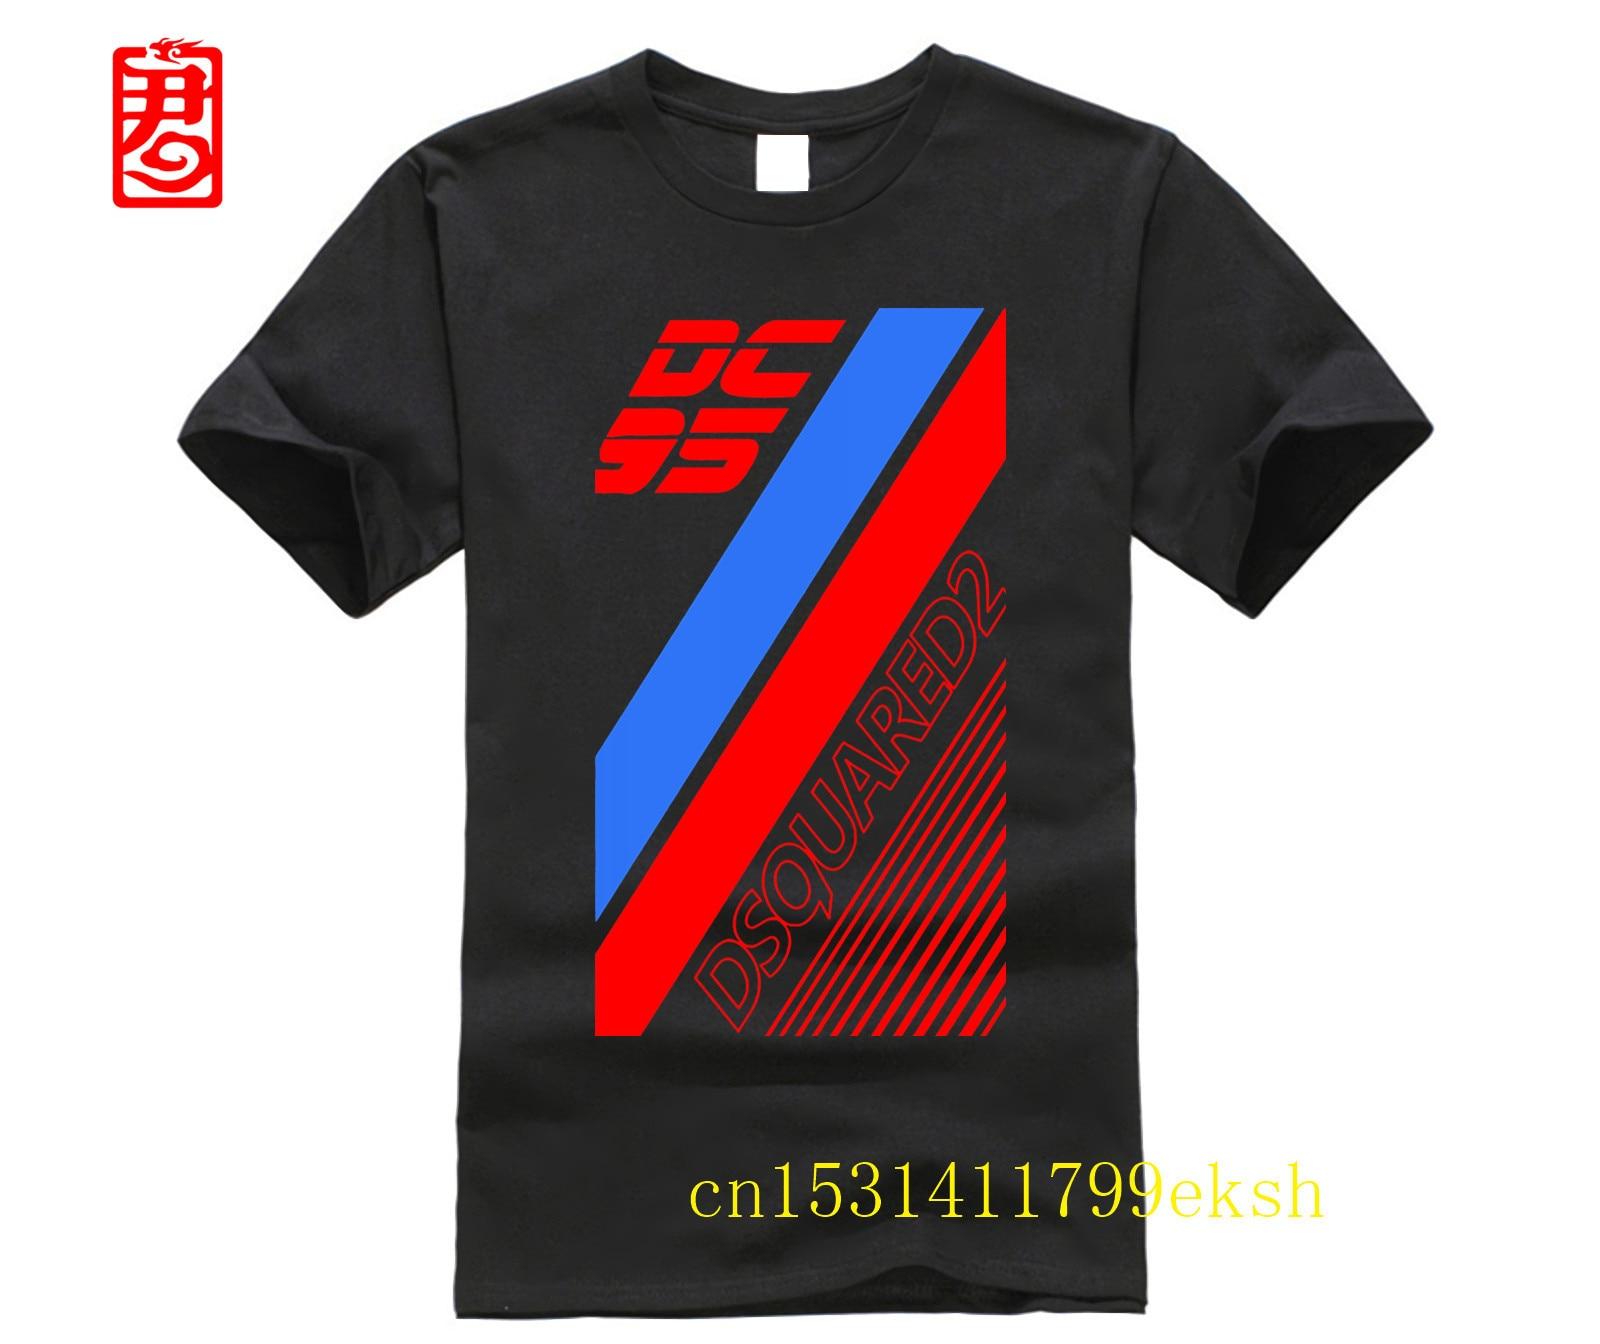 Camiseta para hombre DSQ2, camiseta impresionante de manga corta, Hombre estampado básica de 100% de algodón, camisetas impresas personalizadas, camiseta para hombre